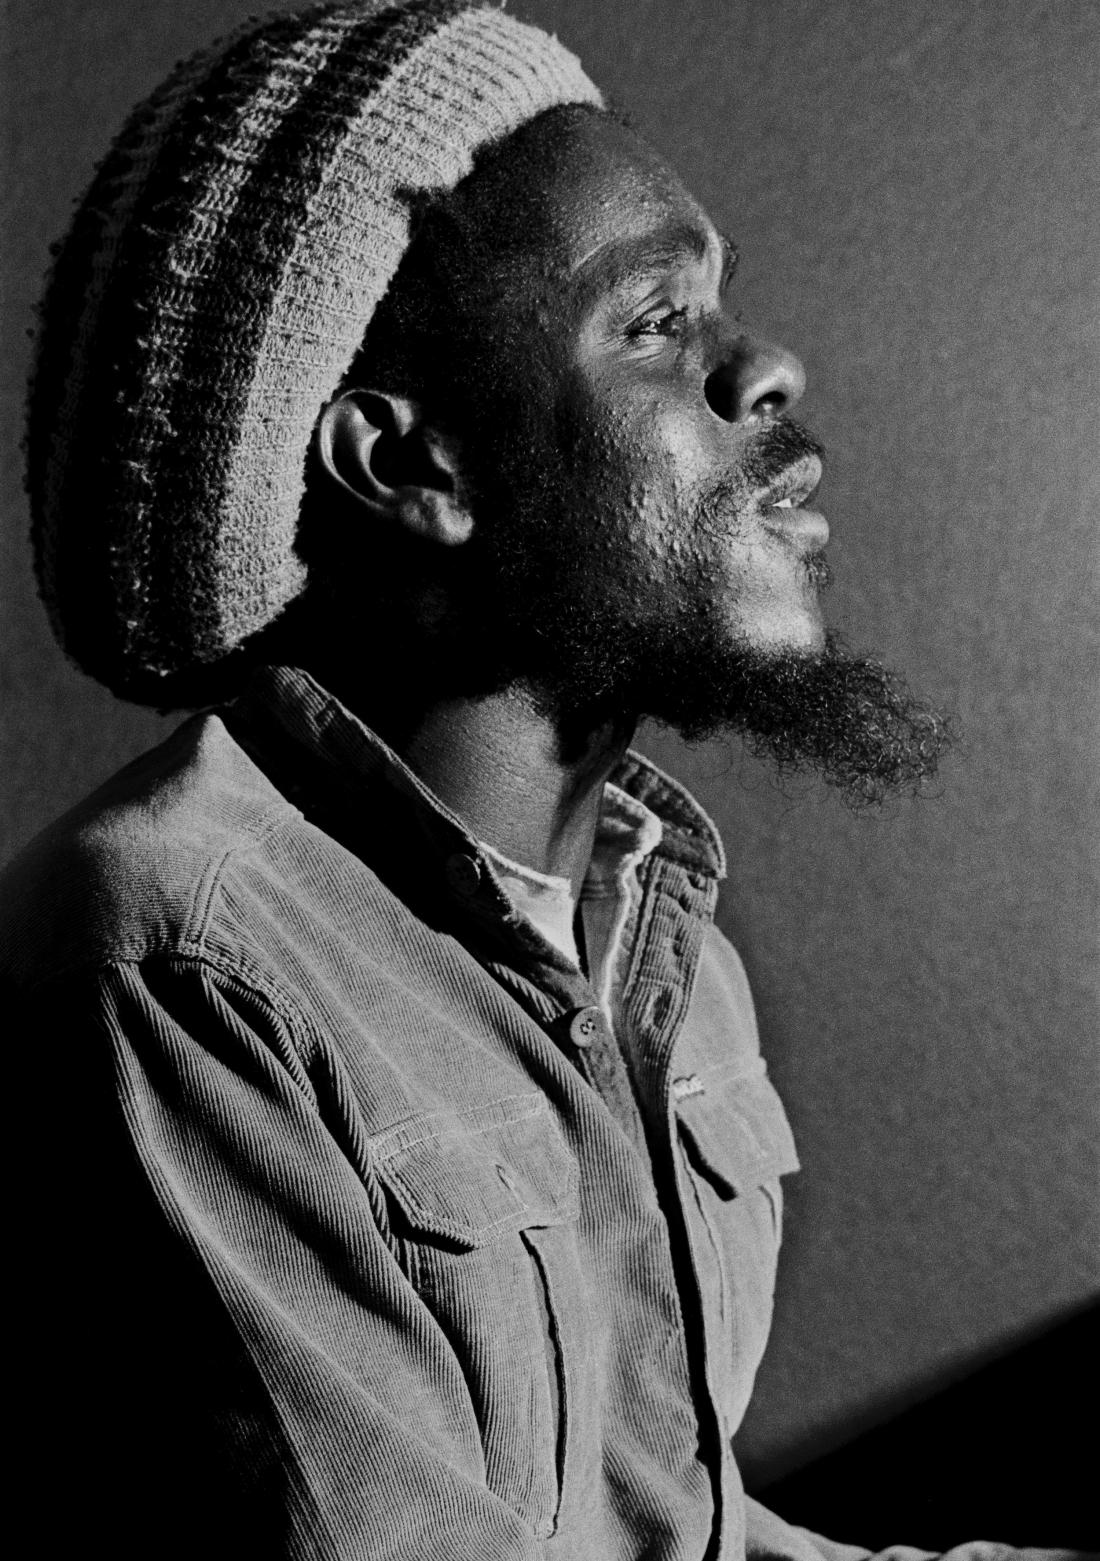 Jamaican reggae artist Dennis Brown at Berry Street studios, London 1981